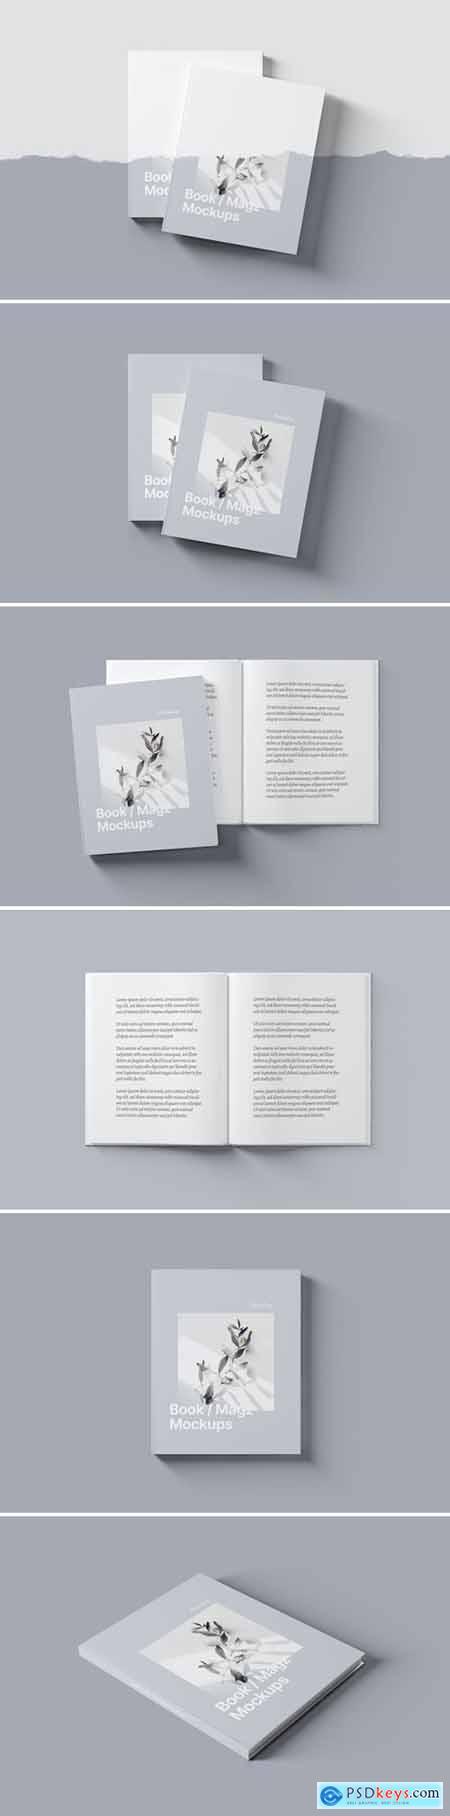 Book - Magazine Cover and Spread Mockups